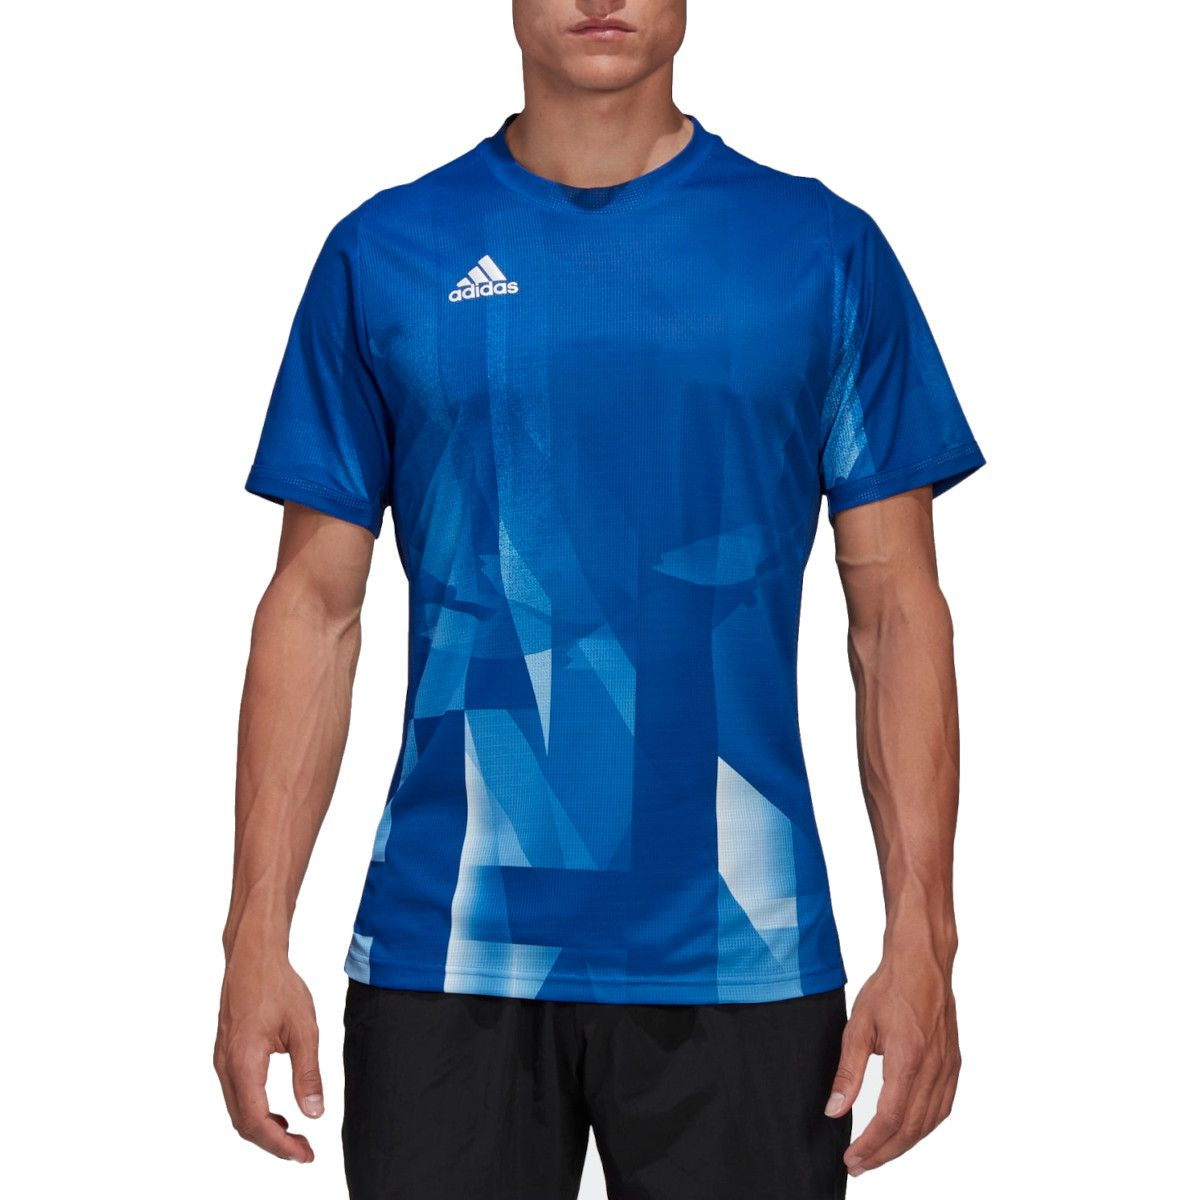 adidas Freelfit Greece Men's Tennis Tee